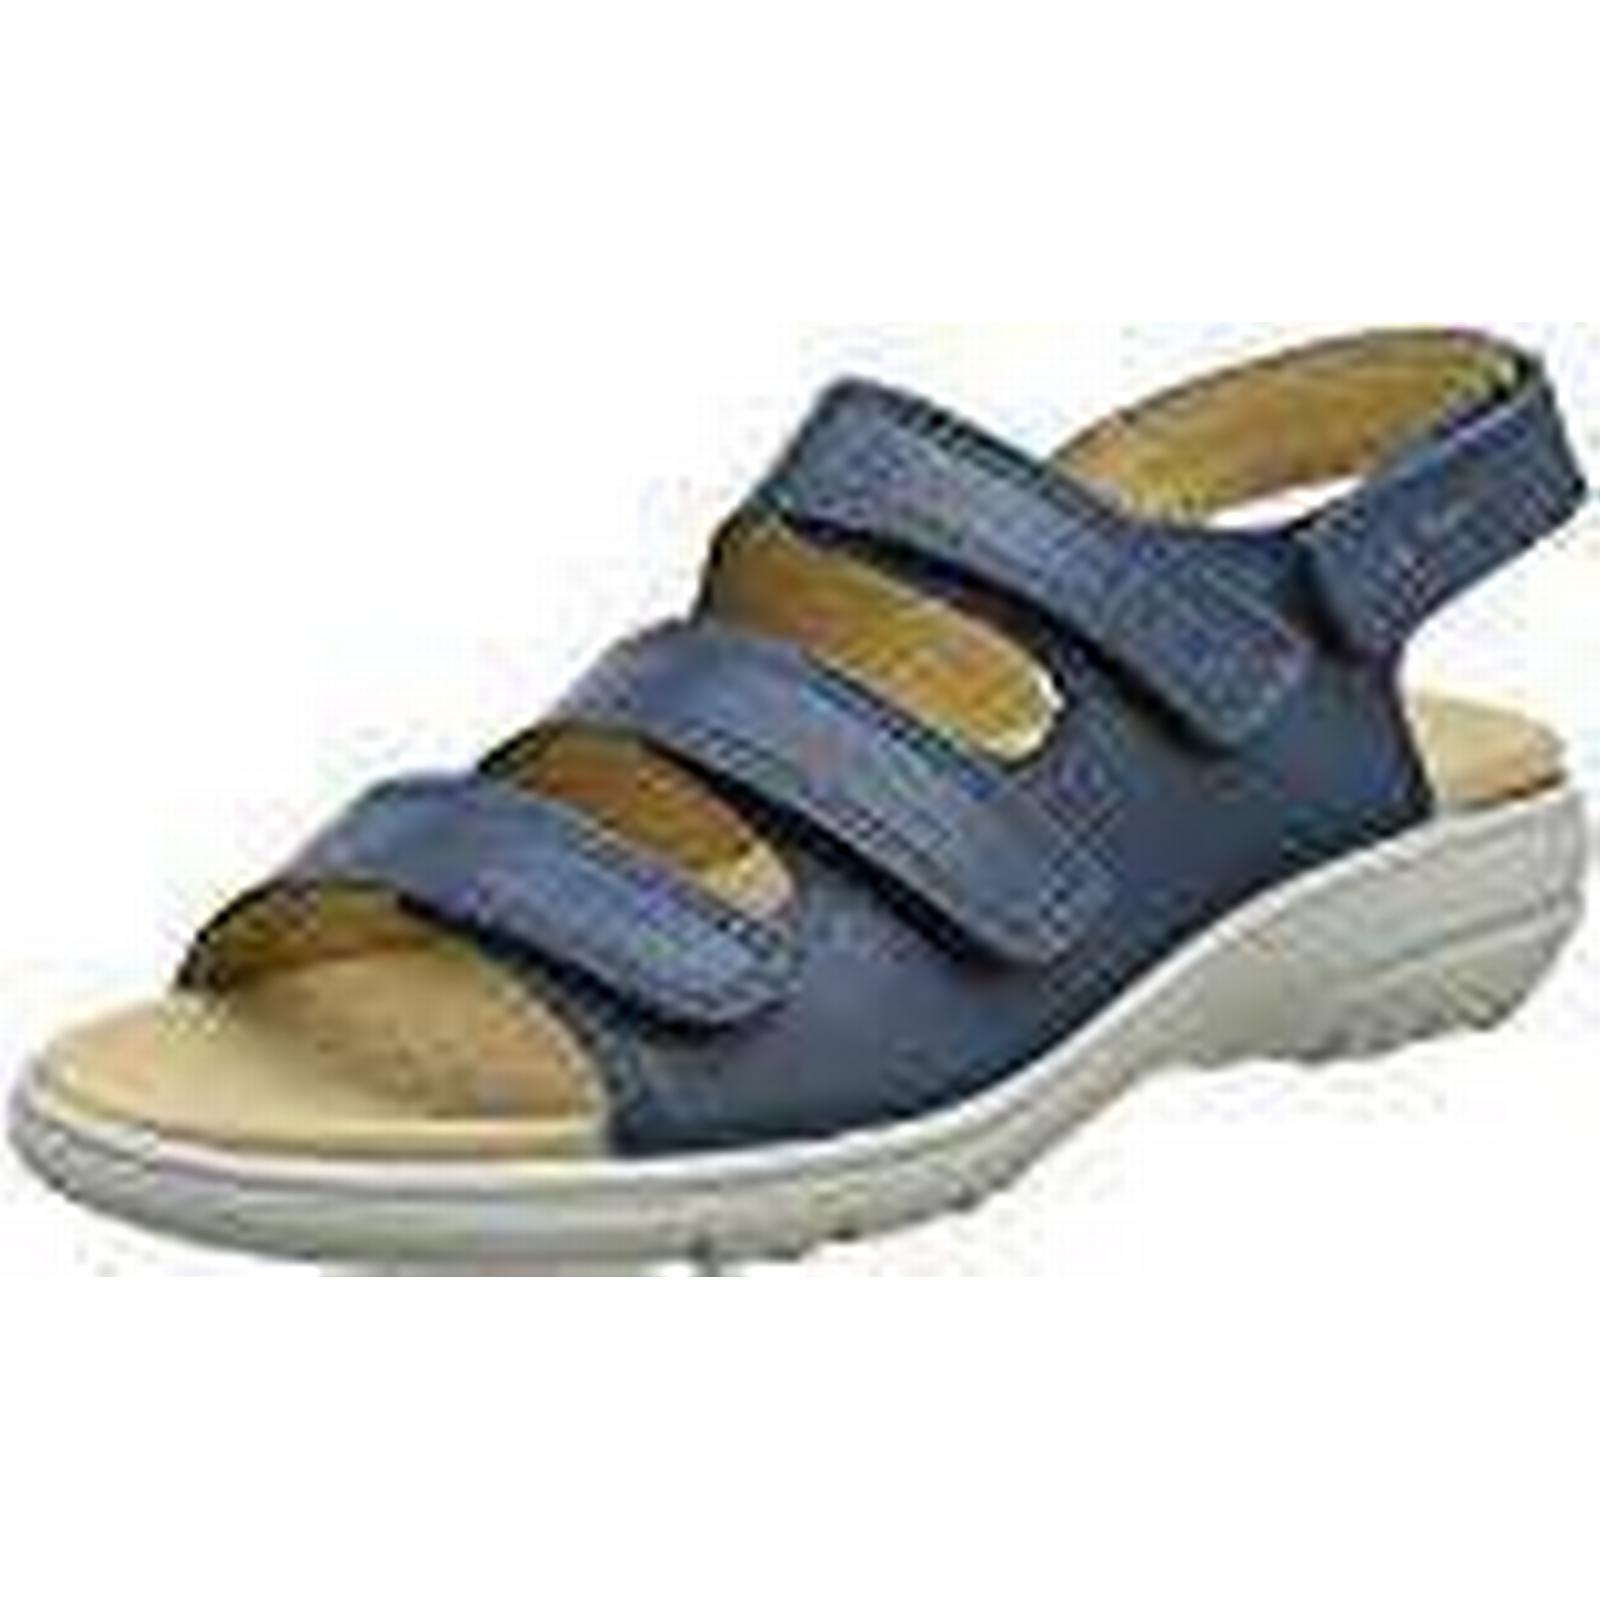 Hotter Women's Sophia UK Open-Toe Sandals, Blue (Blue River), 6 UK Sophia 39 EU 5dfd6e